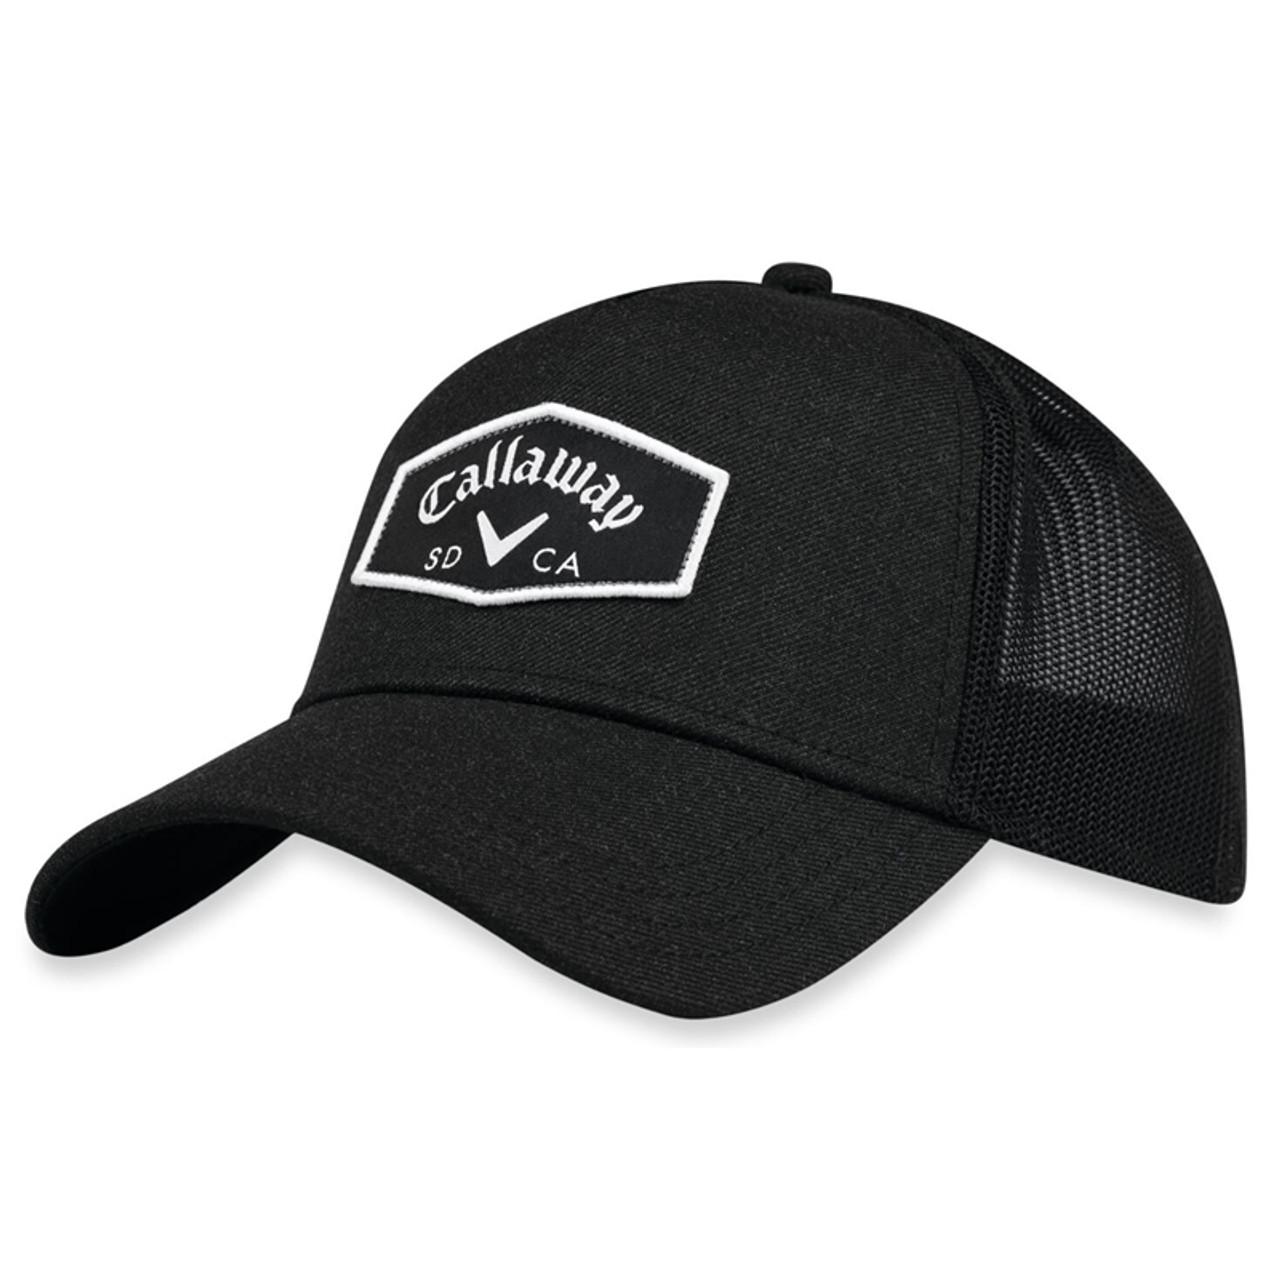 Callaway SD CA Trucker Cap - Black